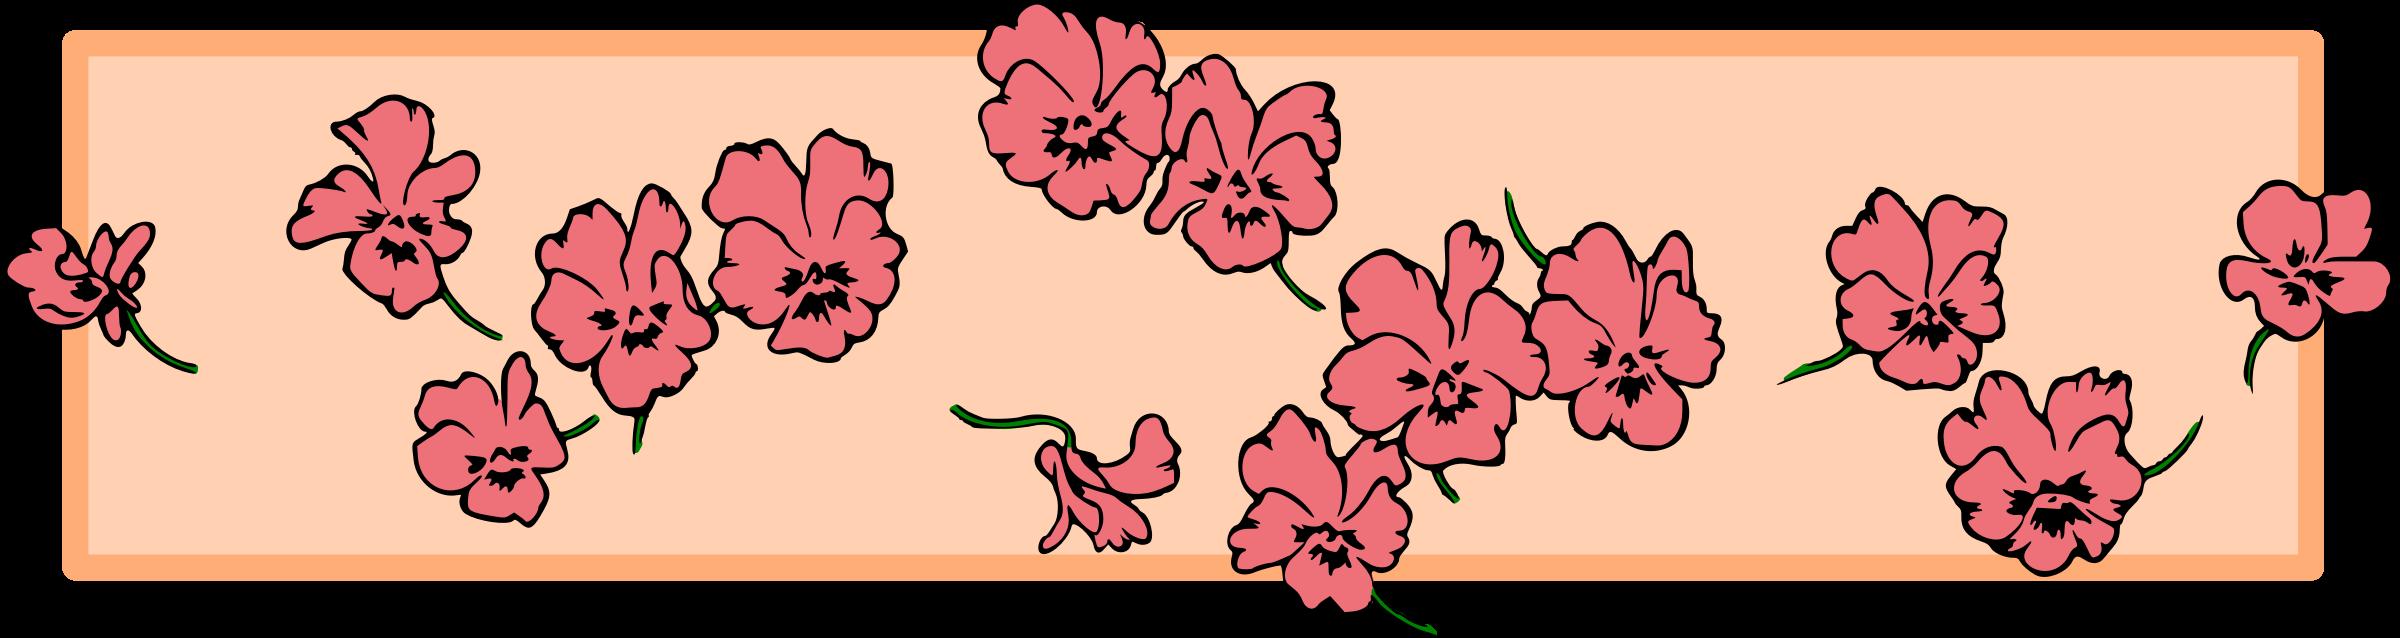 Flower divider clipart clipart black and white Clipart - Floral divider (colour) clipart black and white